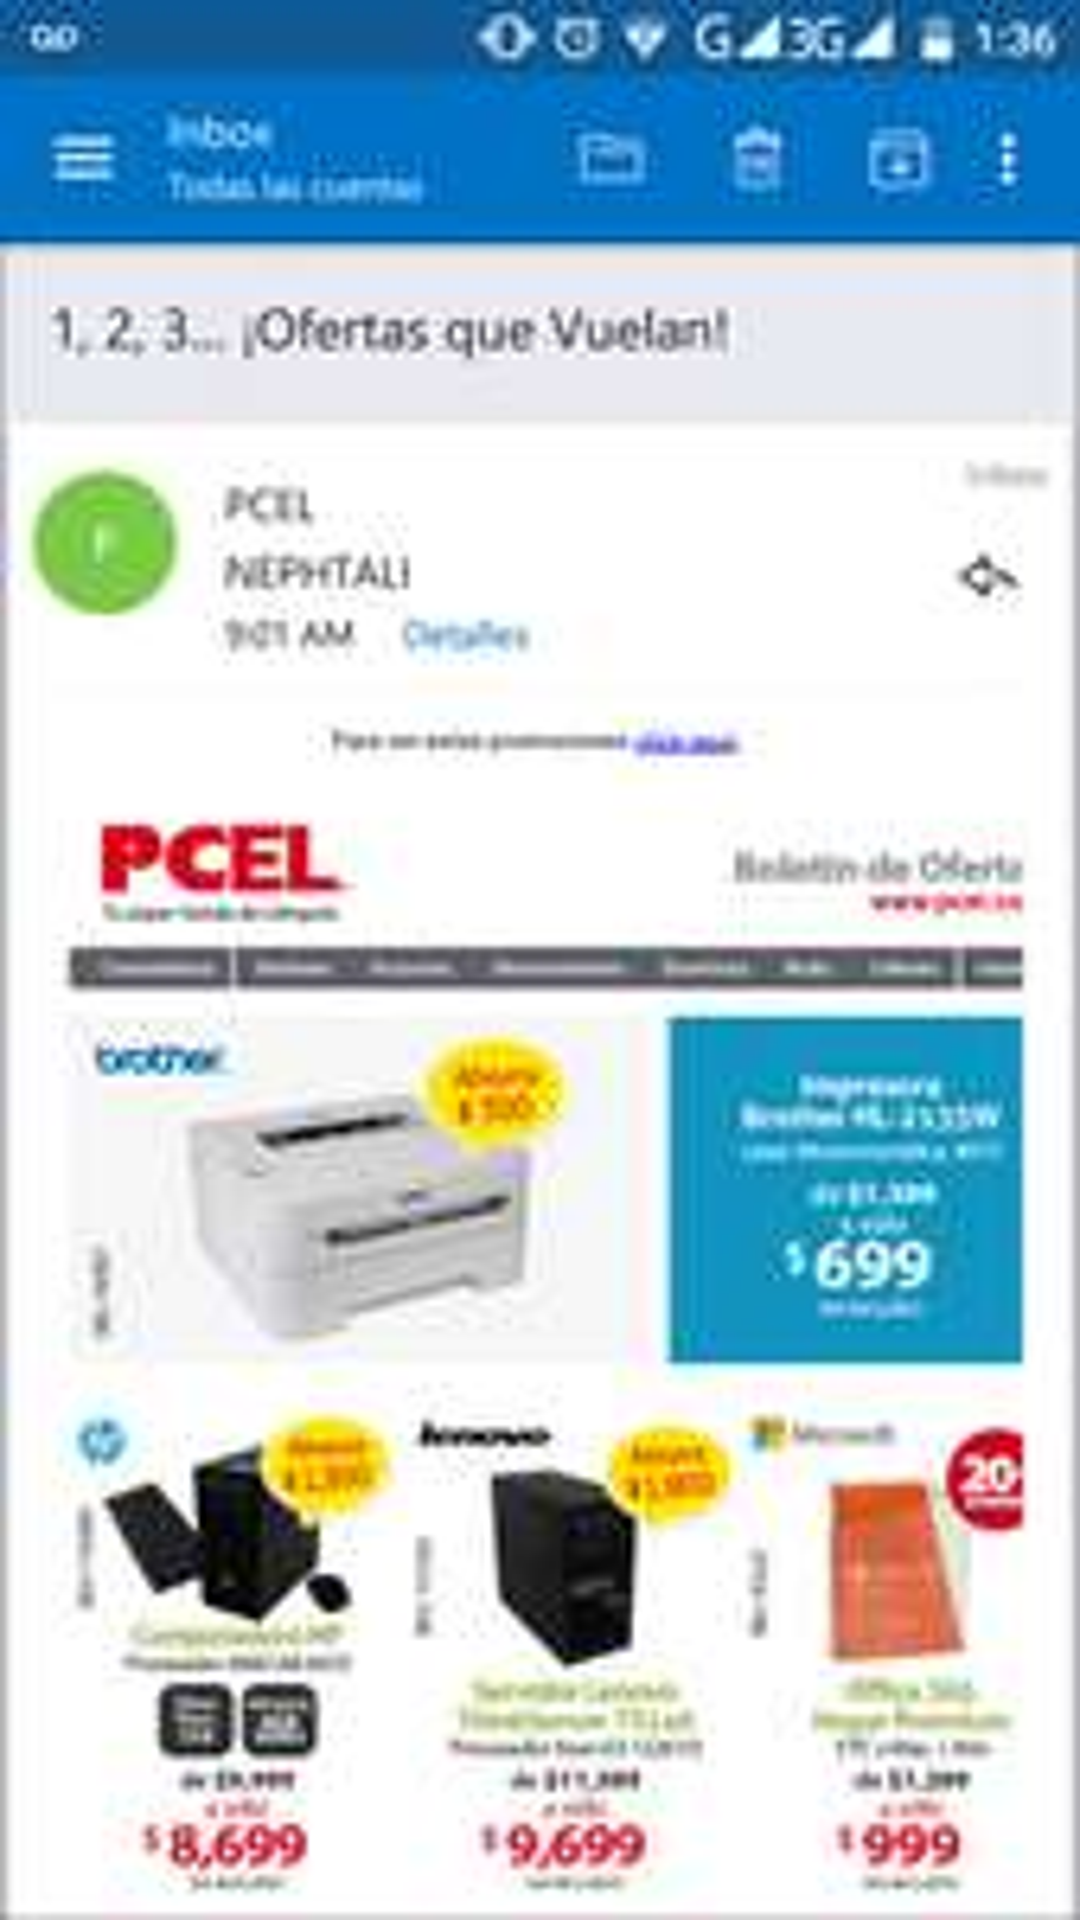 PCEL: Impresora laser blanco y negro wifi brother HL-2135W